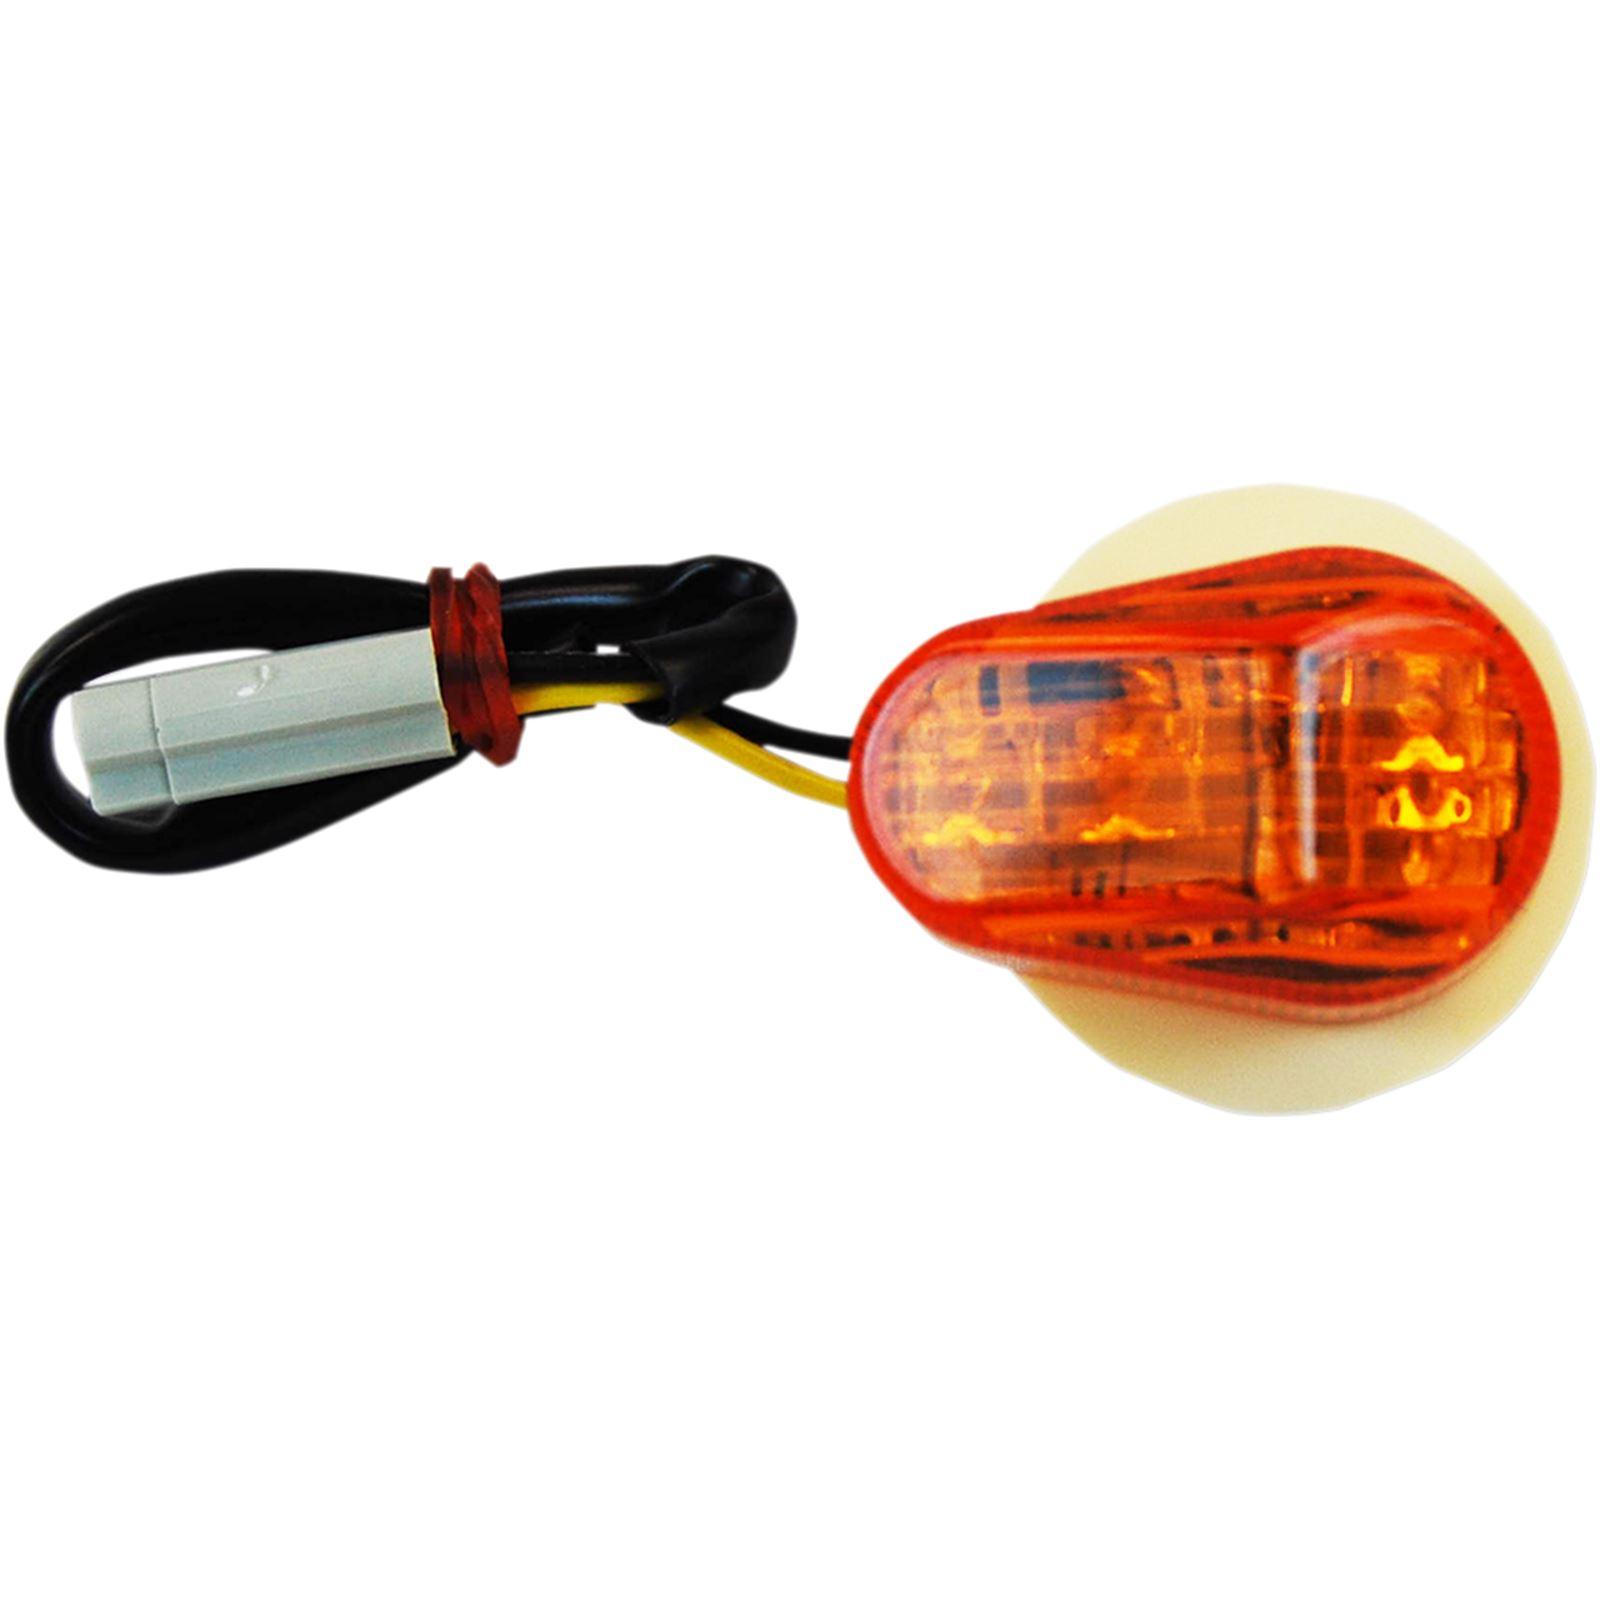 Comp. Werkes LED Marker Lights - Yamaha - Amber